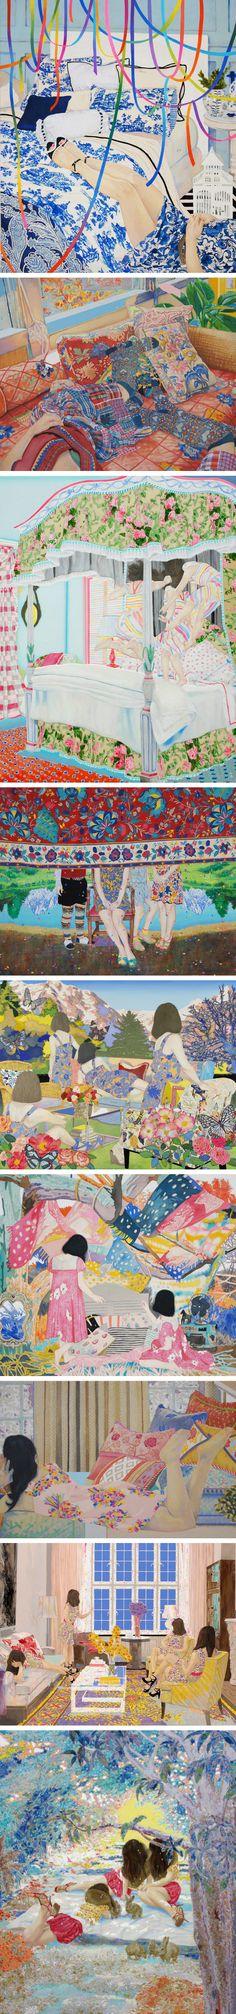 This is my dream world. Naomi Okubo – Tokyo, Japan-born artist.